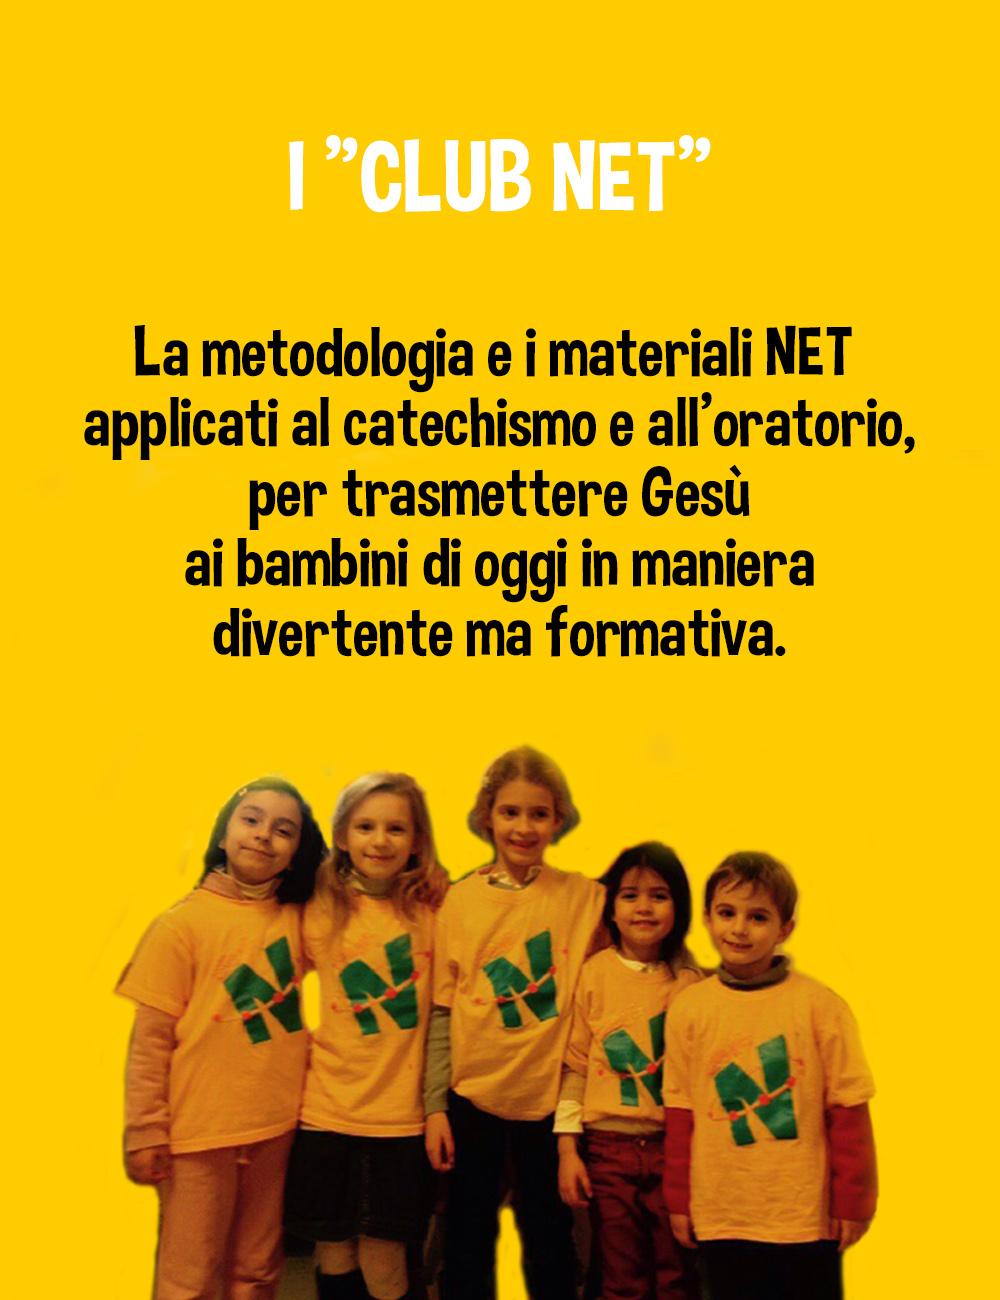 I Club NET